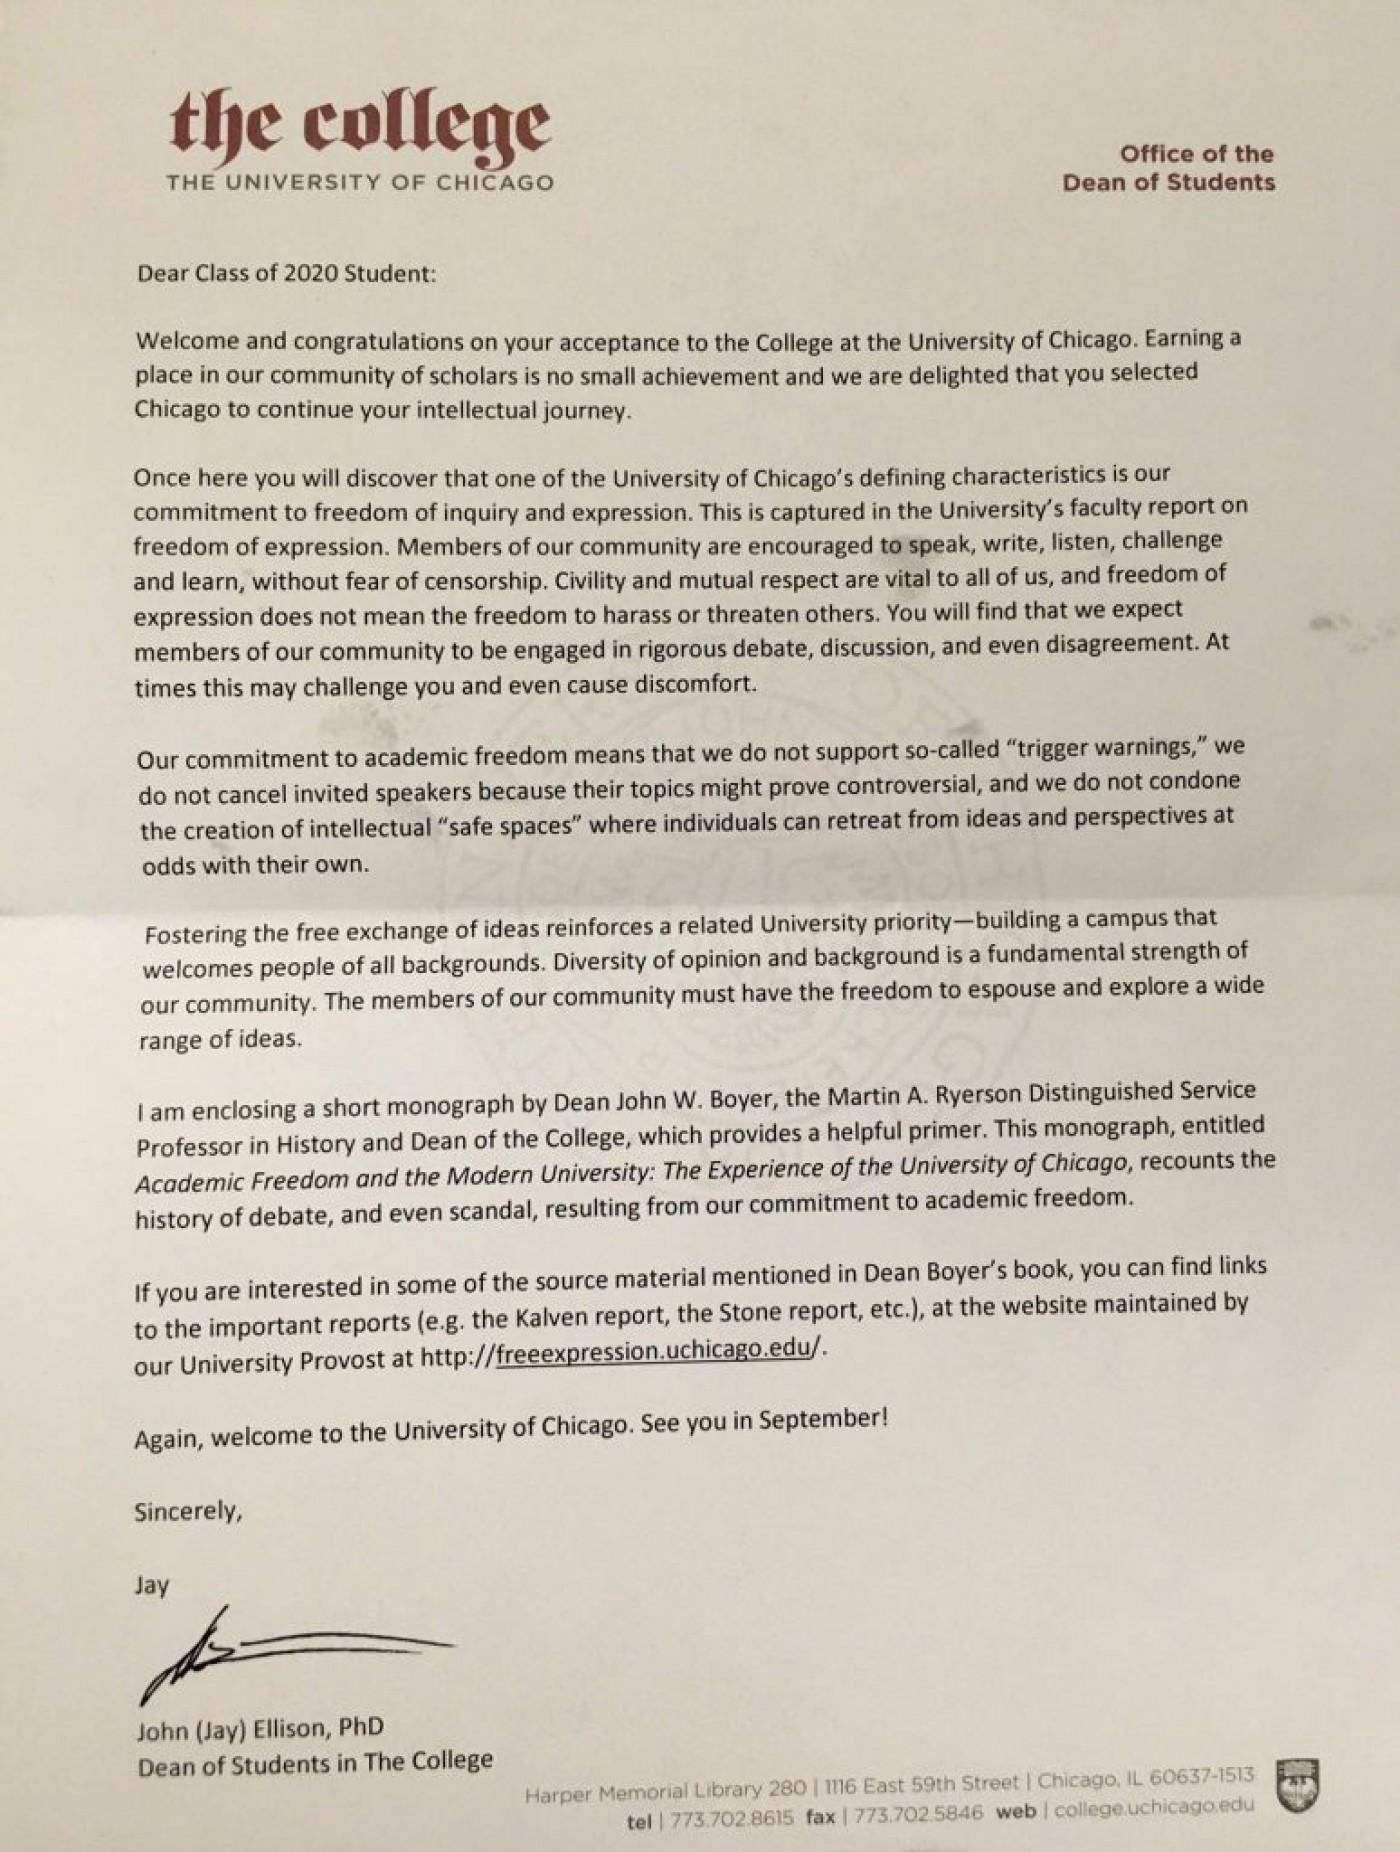 007 University Of Chicago Essay Prompts Example Uchicago Striking Weird Loyola Prompt 2014 1400